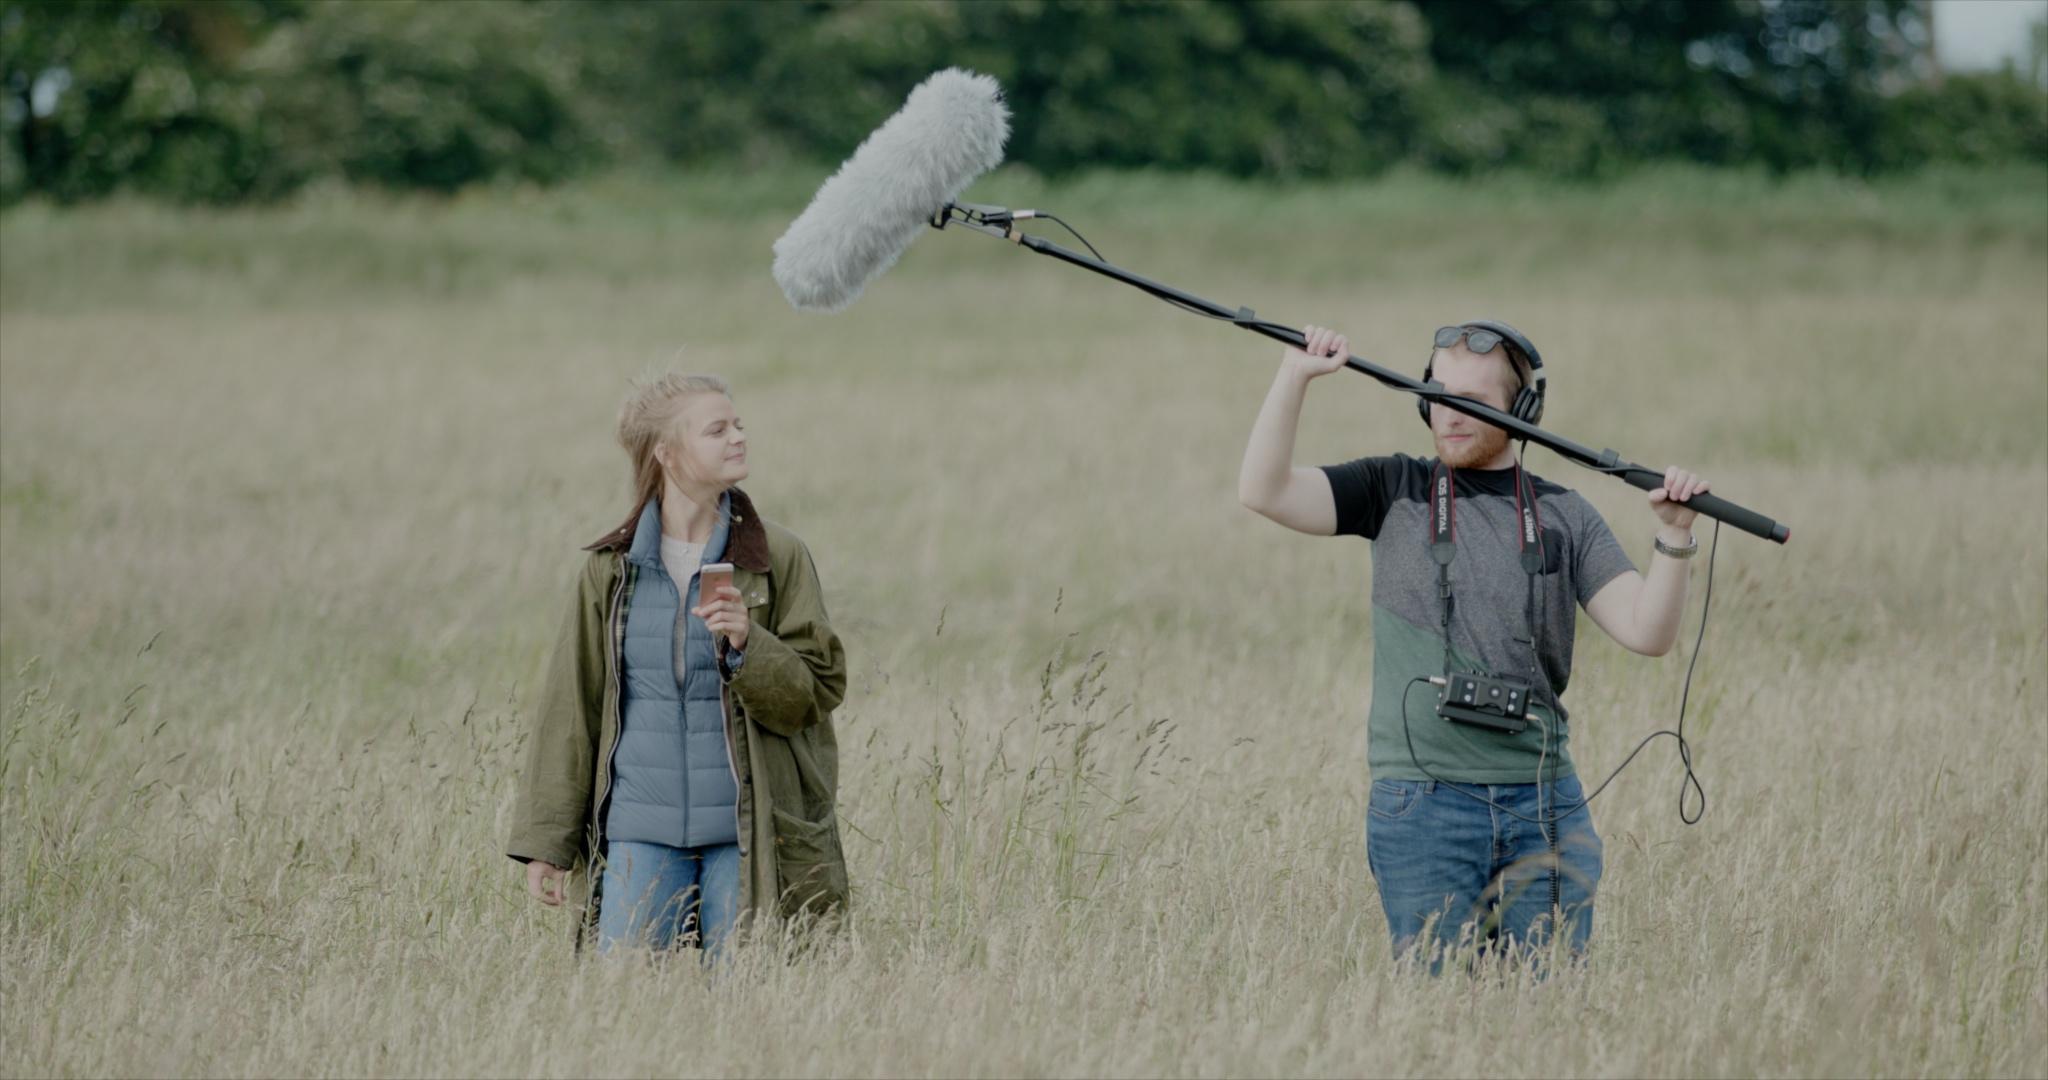 Sound recordist Peter Baumann capturing location audio for The Carbon Farmer